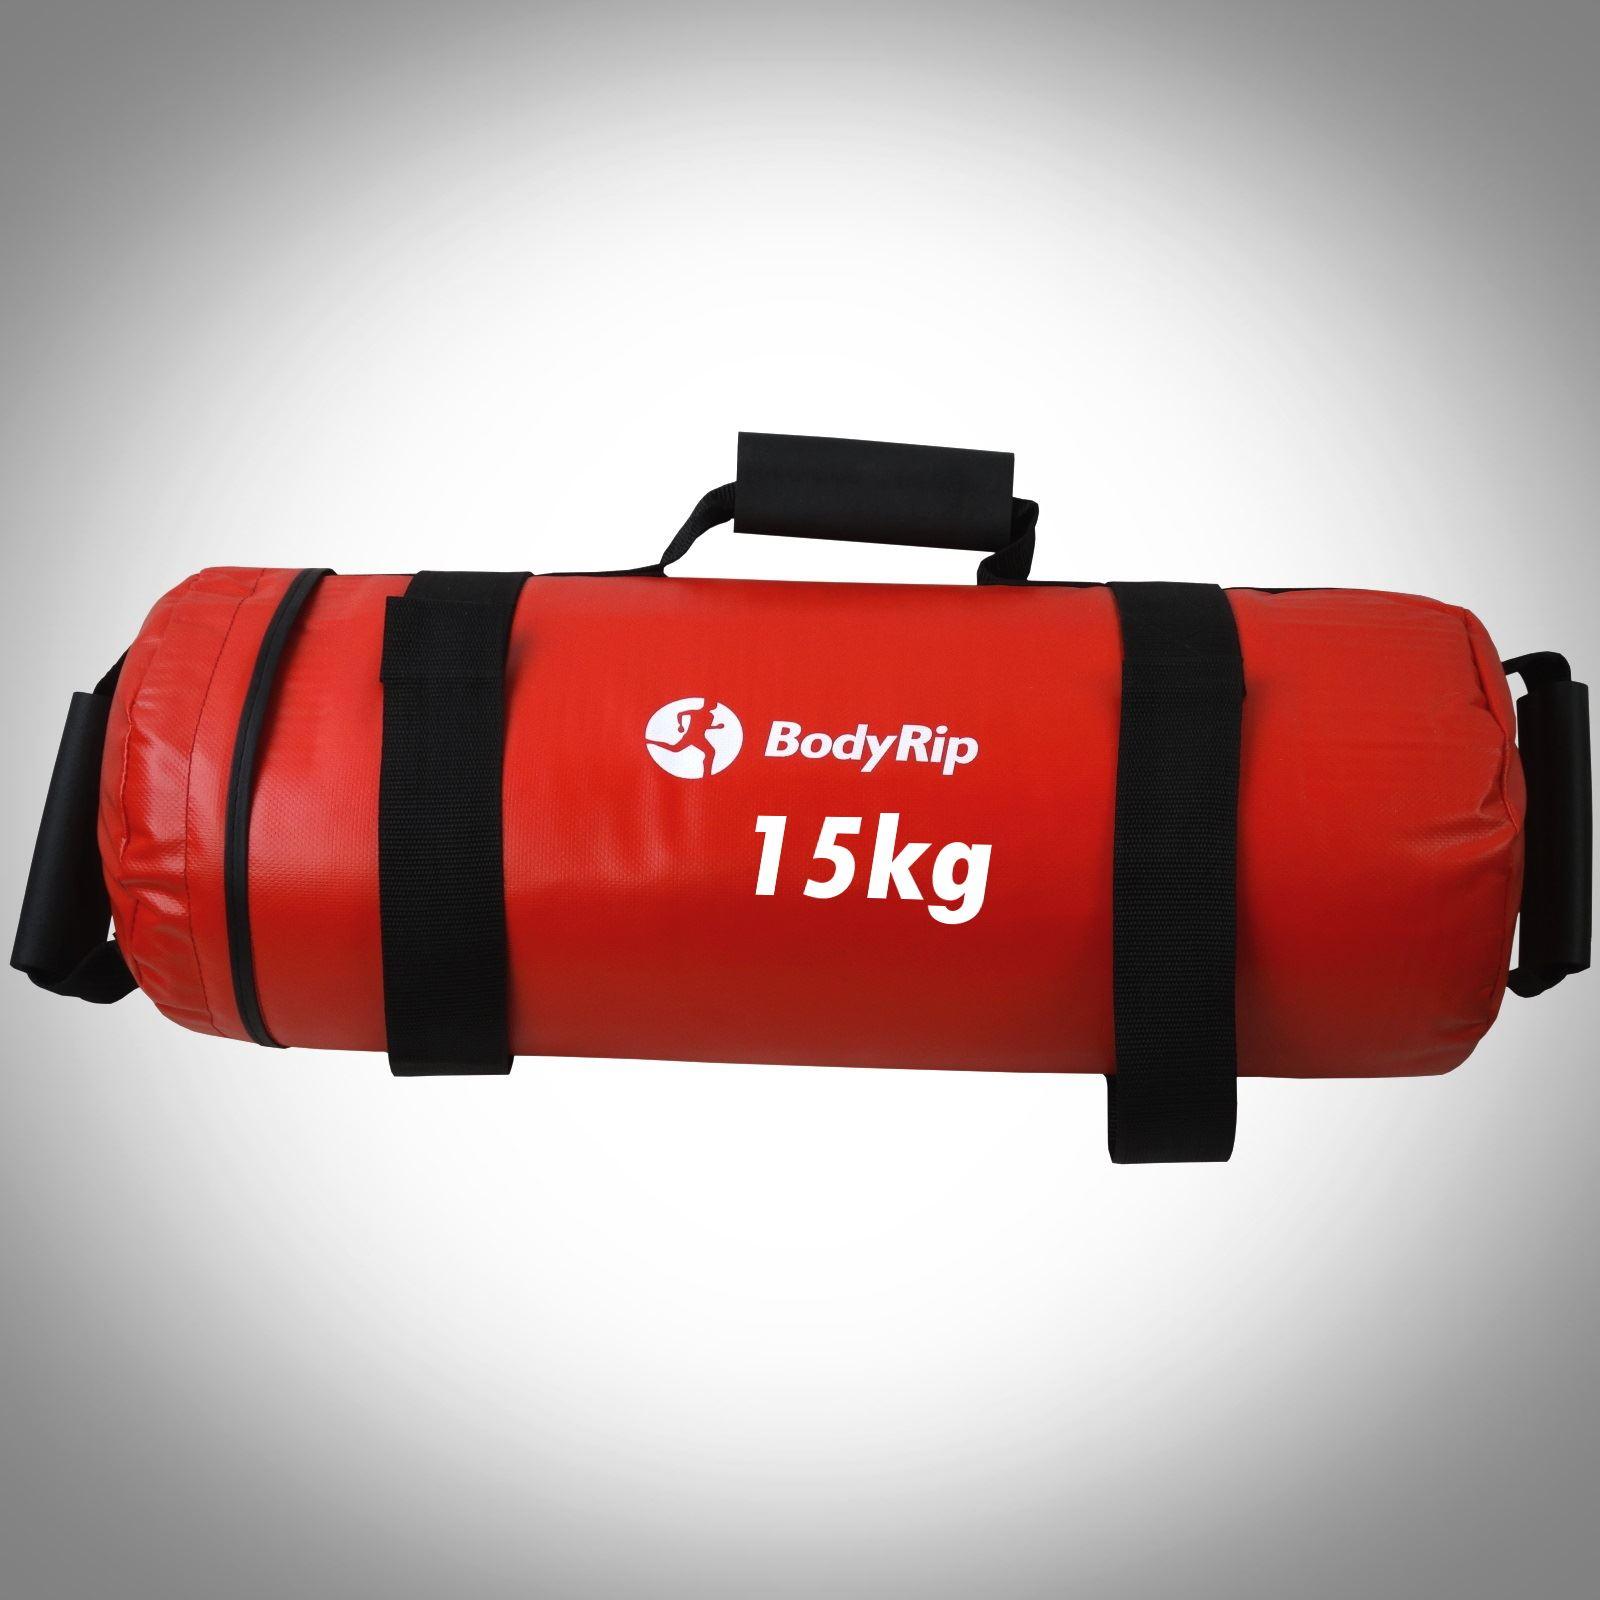 Bodyrip potencia arena peso saco de arena bag lluvia - 1m3 de sable en kg ...